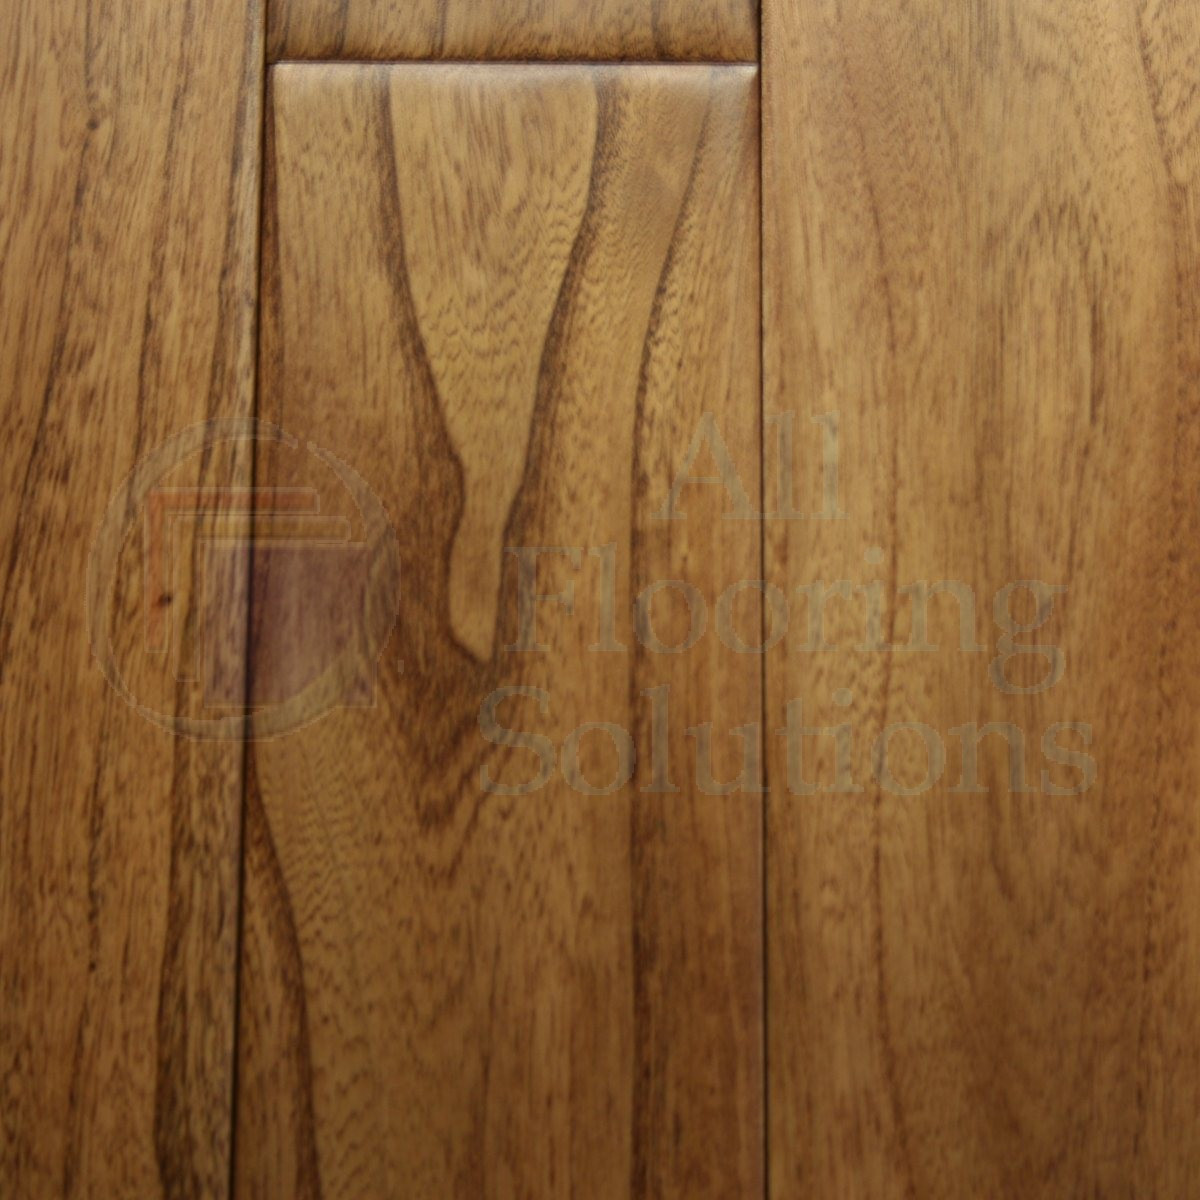 bamboo hardwood flooring reviews of home legend bamboo flooring with regard to home legend bamboo flooring reviews acai sofa